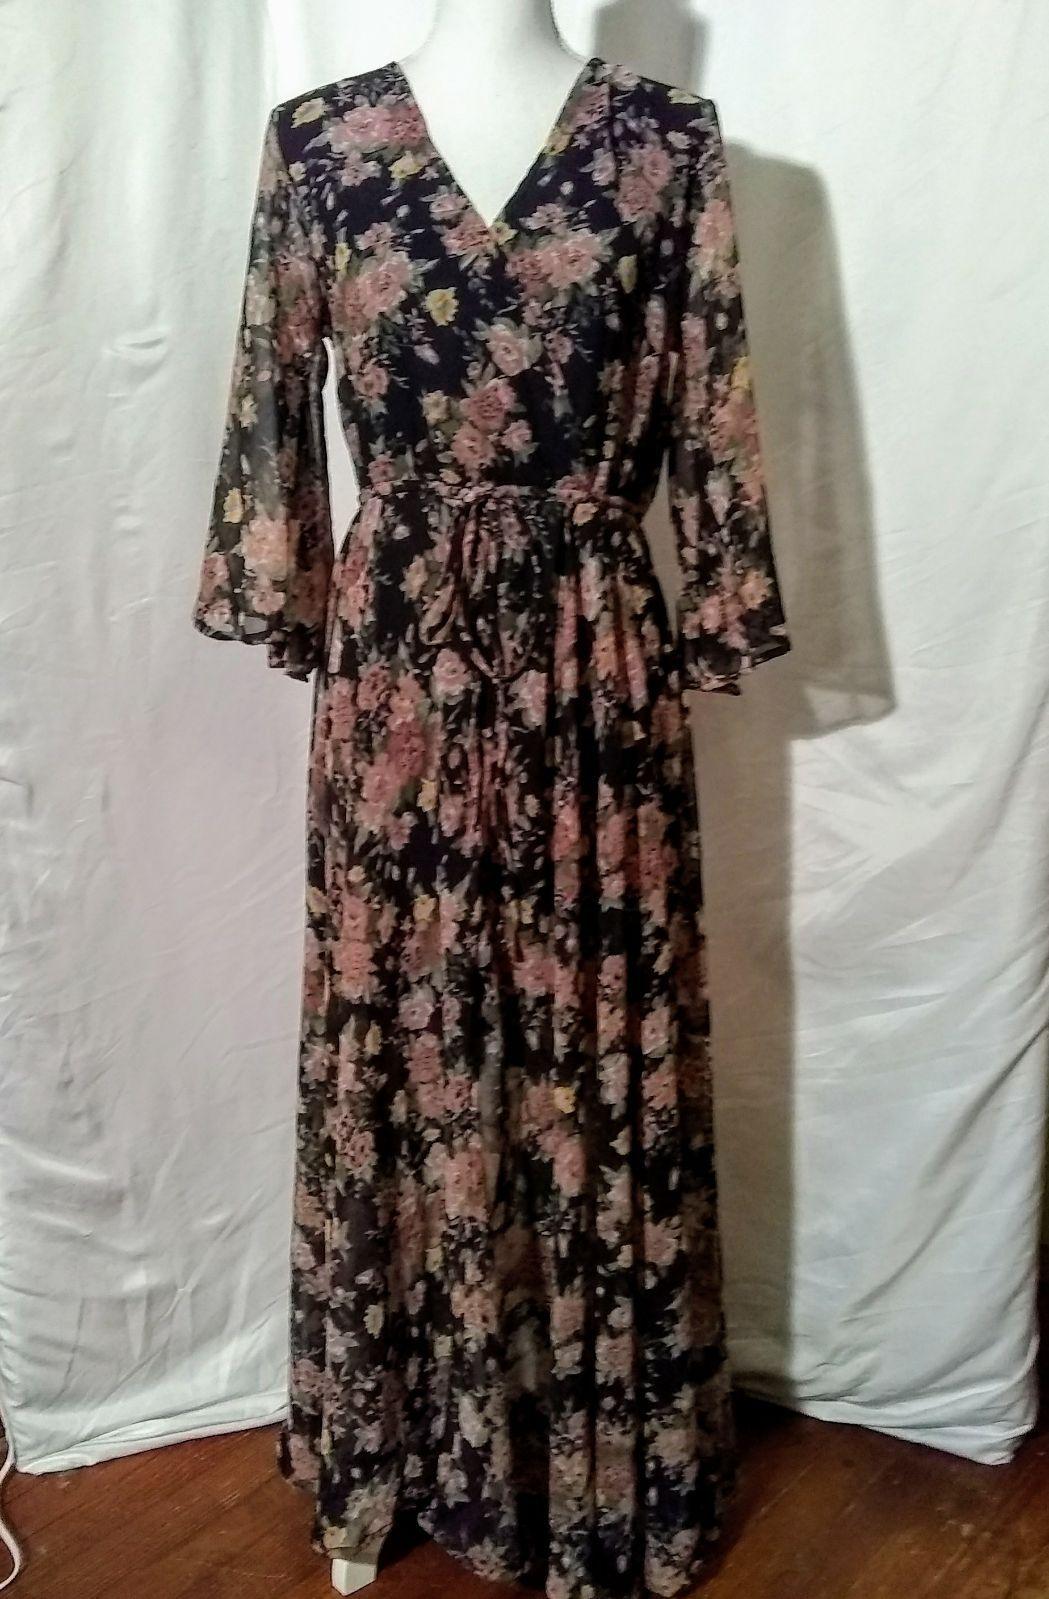 c2cf49db4c52 Spy zone exchange maxi dress | Cloth | Dresses, Clothes, Fashion